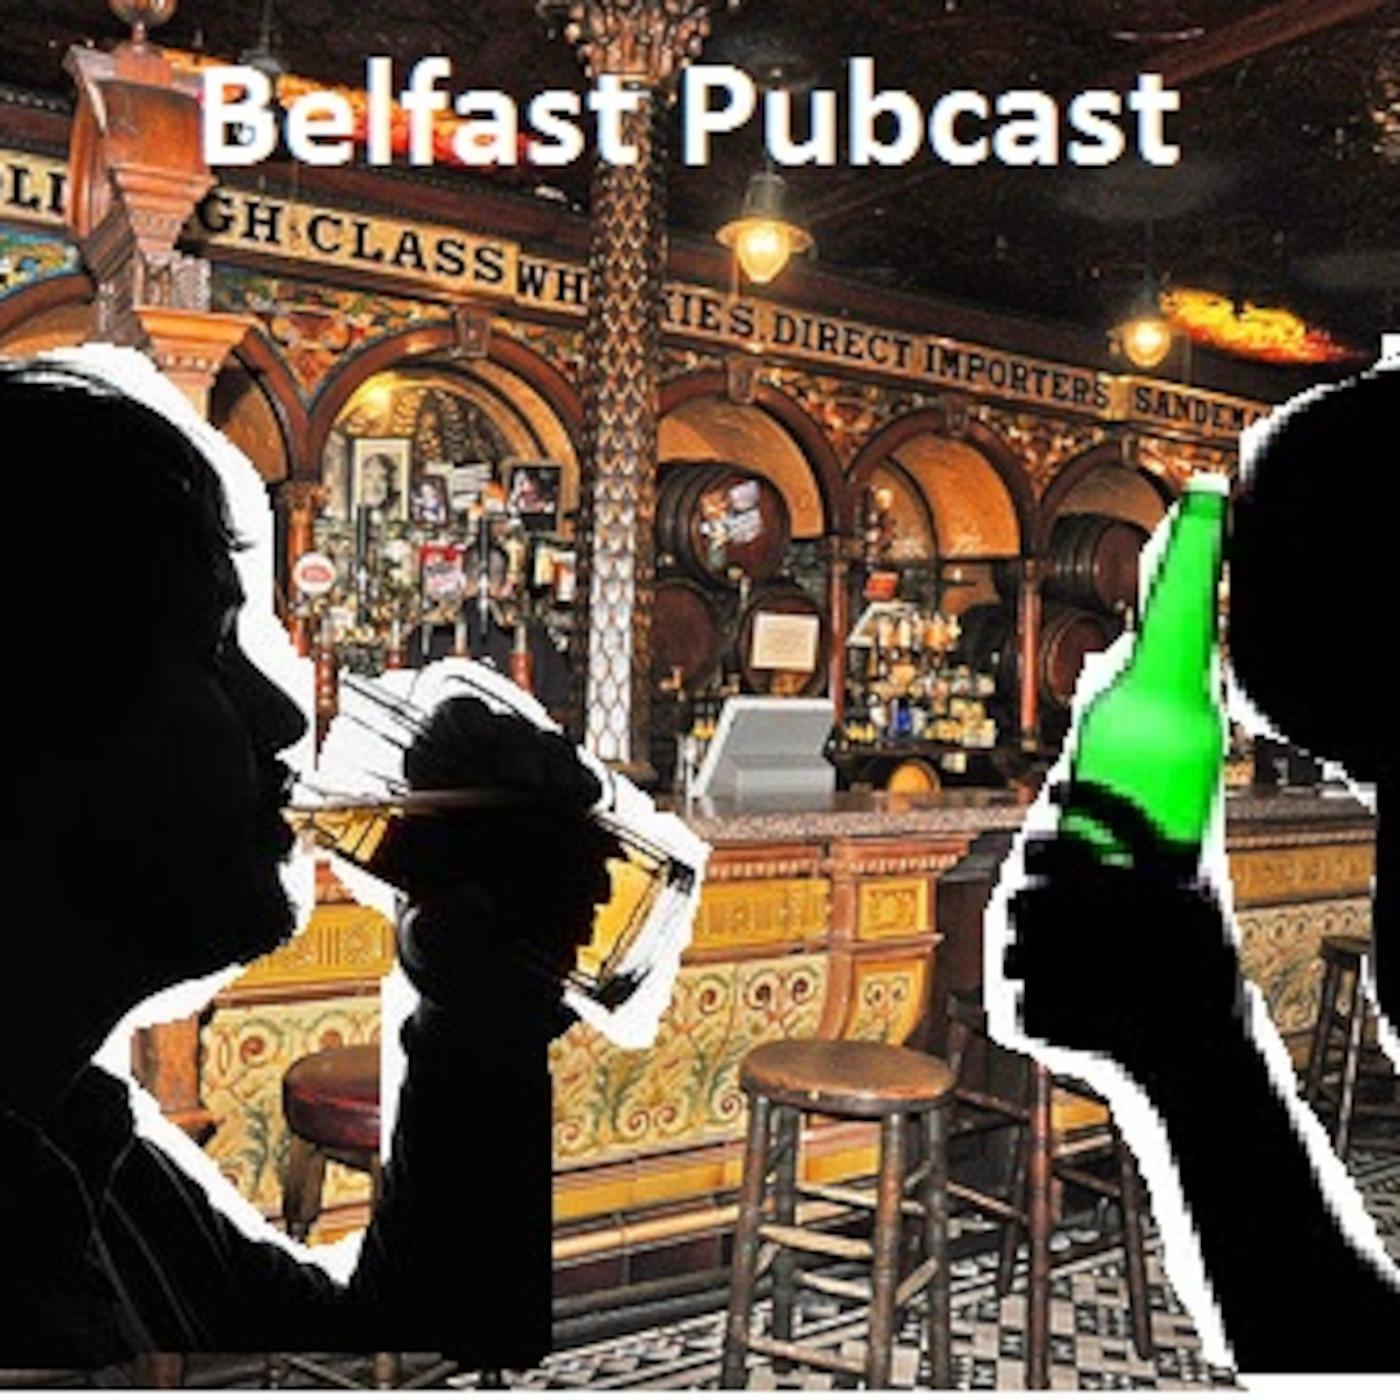 Belfast Pubcast